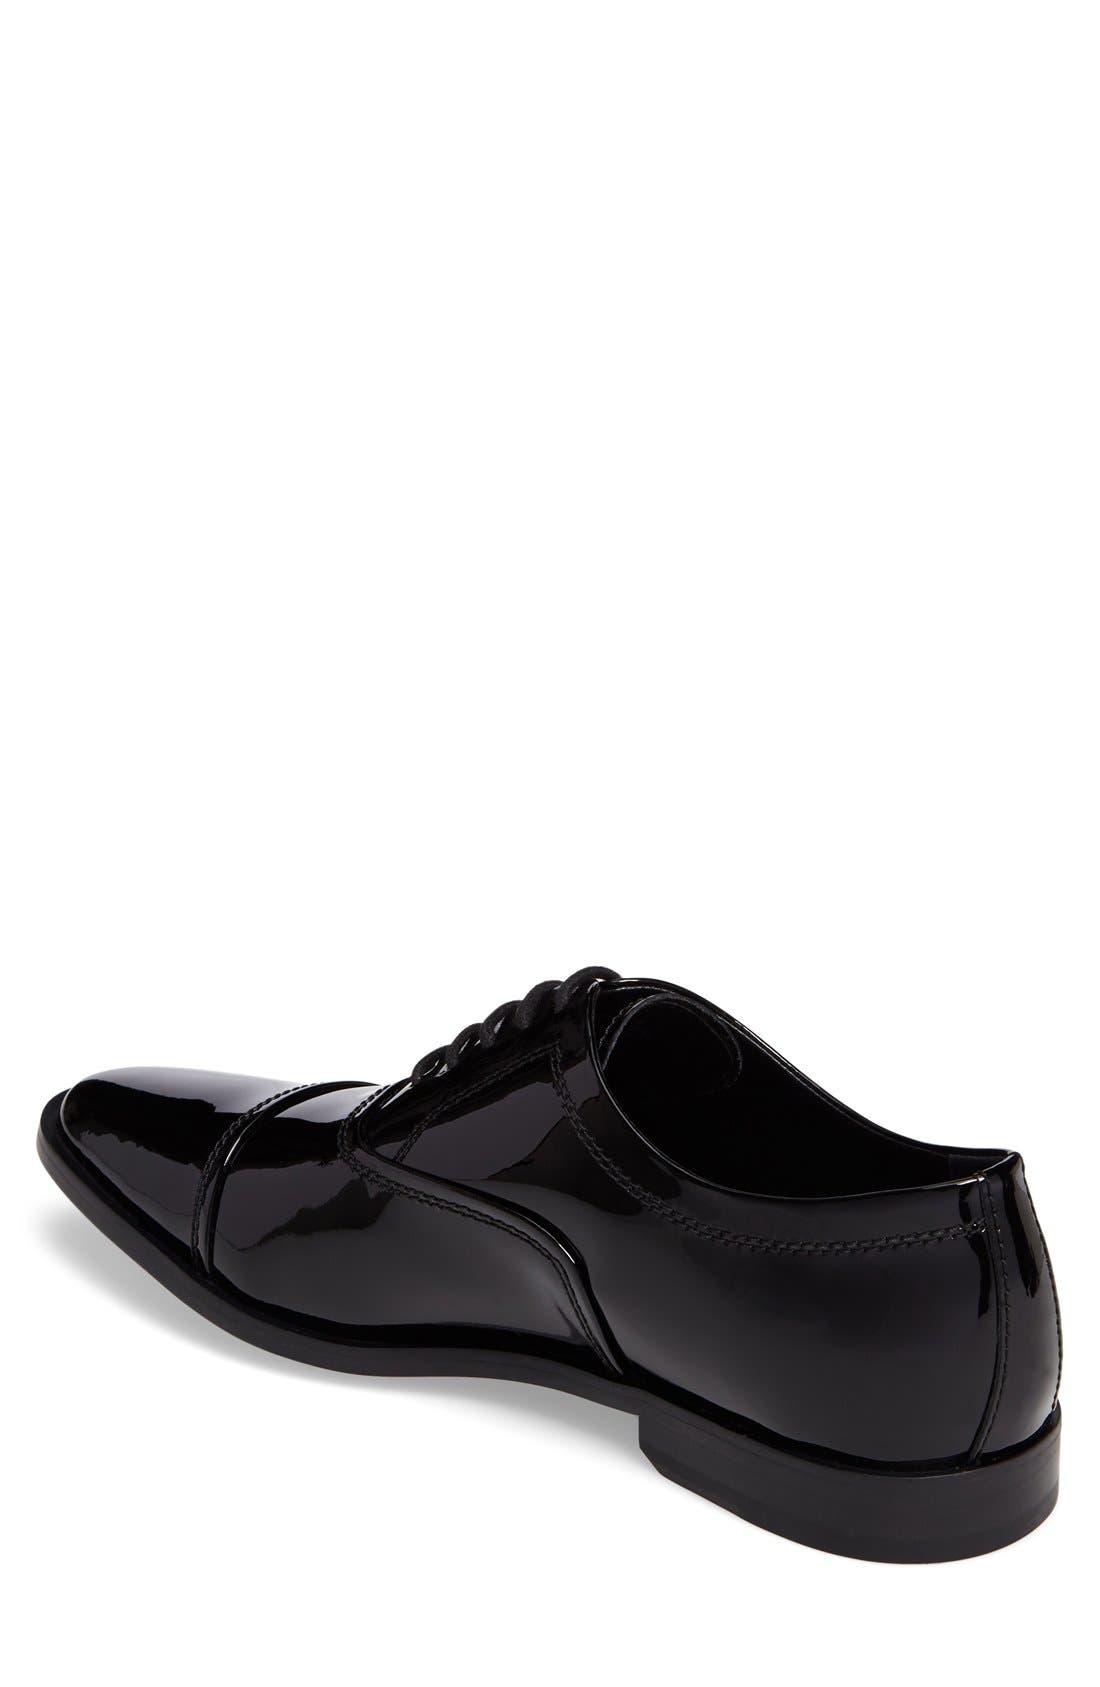 Alternate Image 2  - Calvin Klein 'Nino' Cap Toe Oxford (Men)